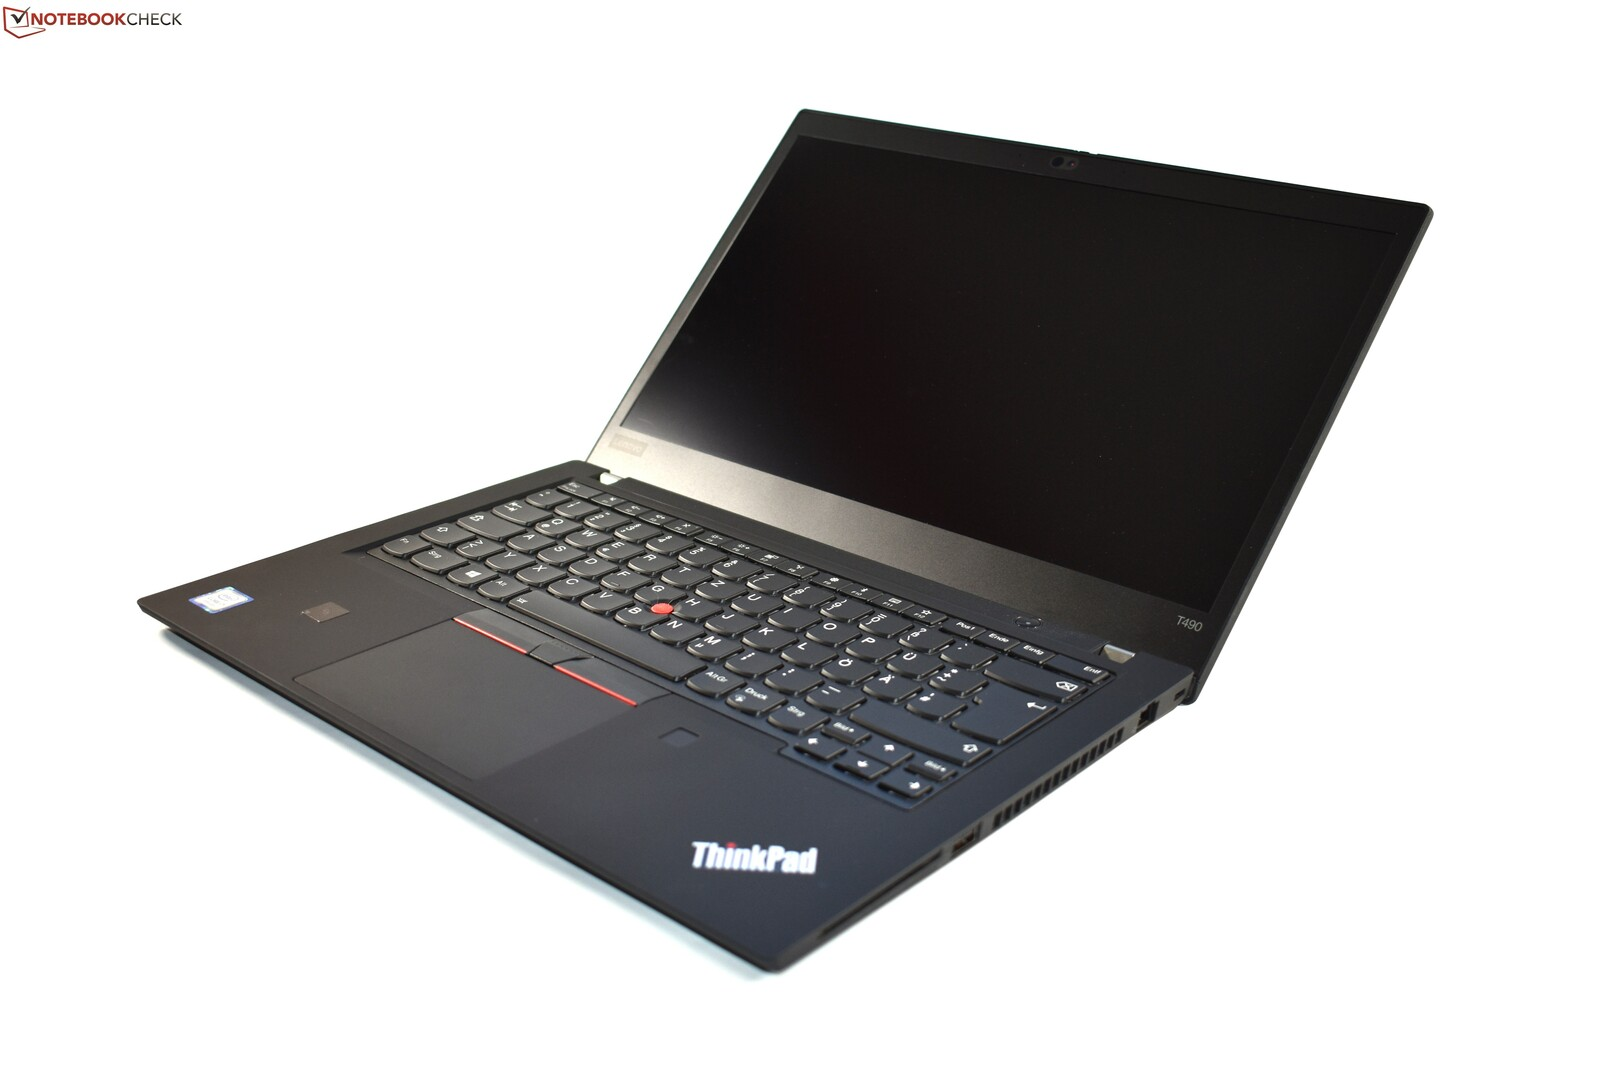 Lenovo ThinkPad T490 (i7, MX250, Low Power FHD) Laptop